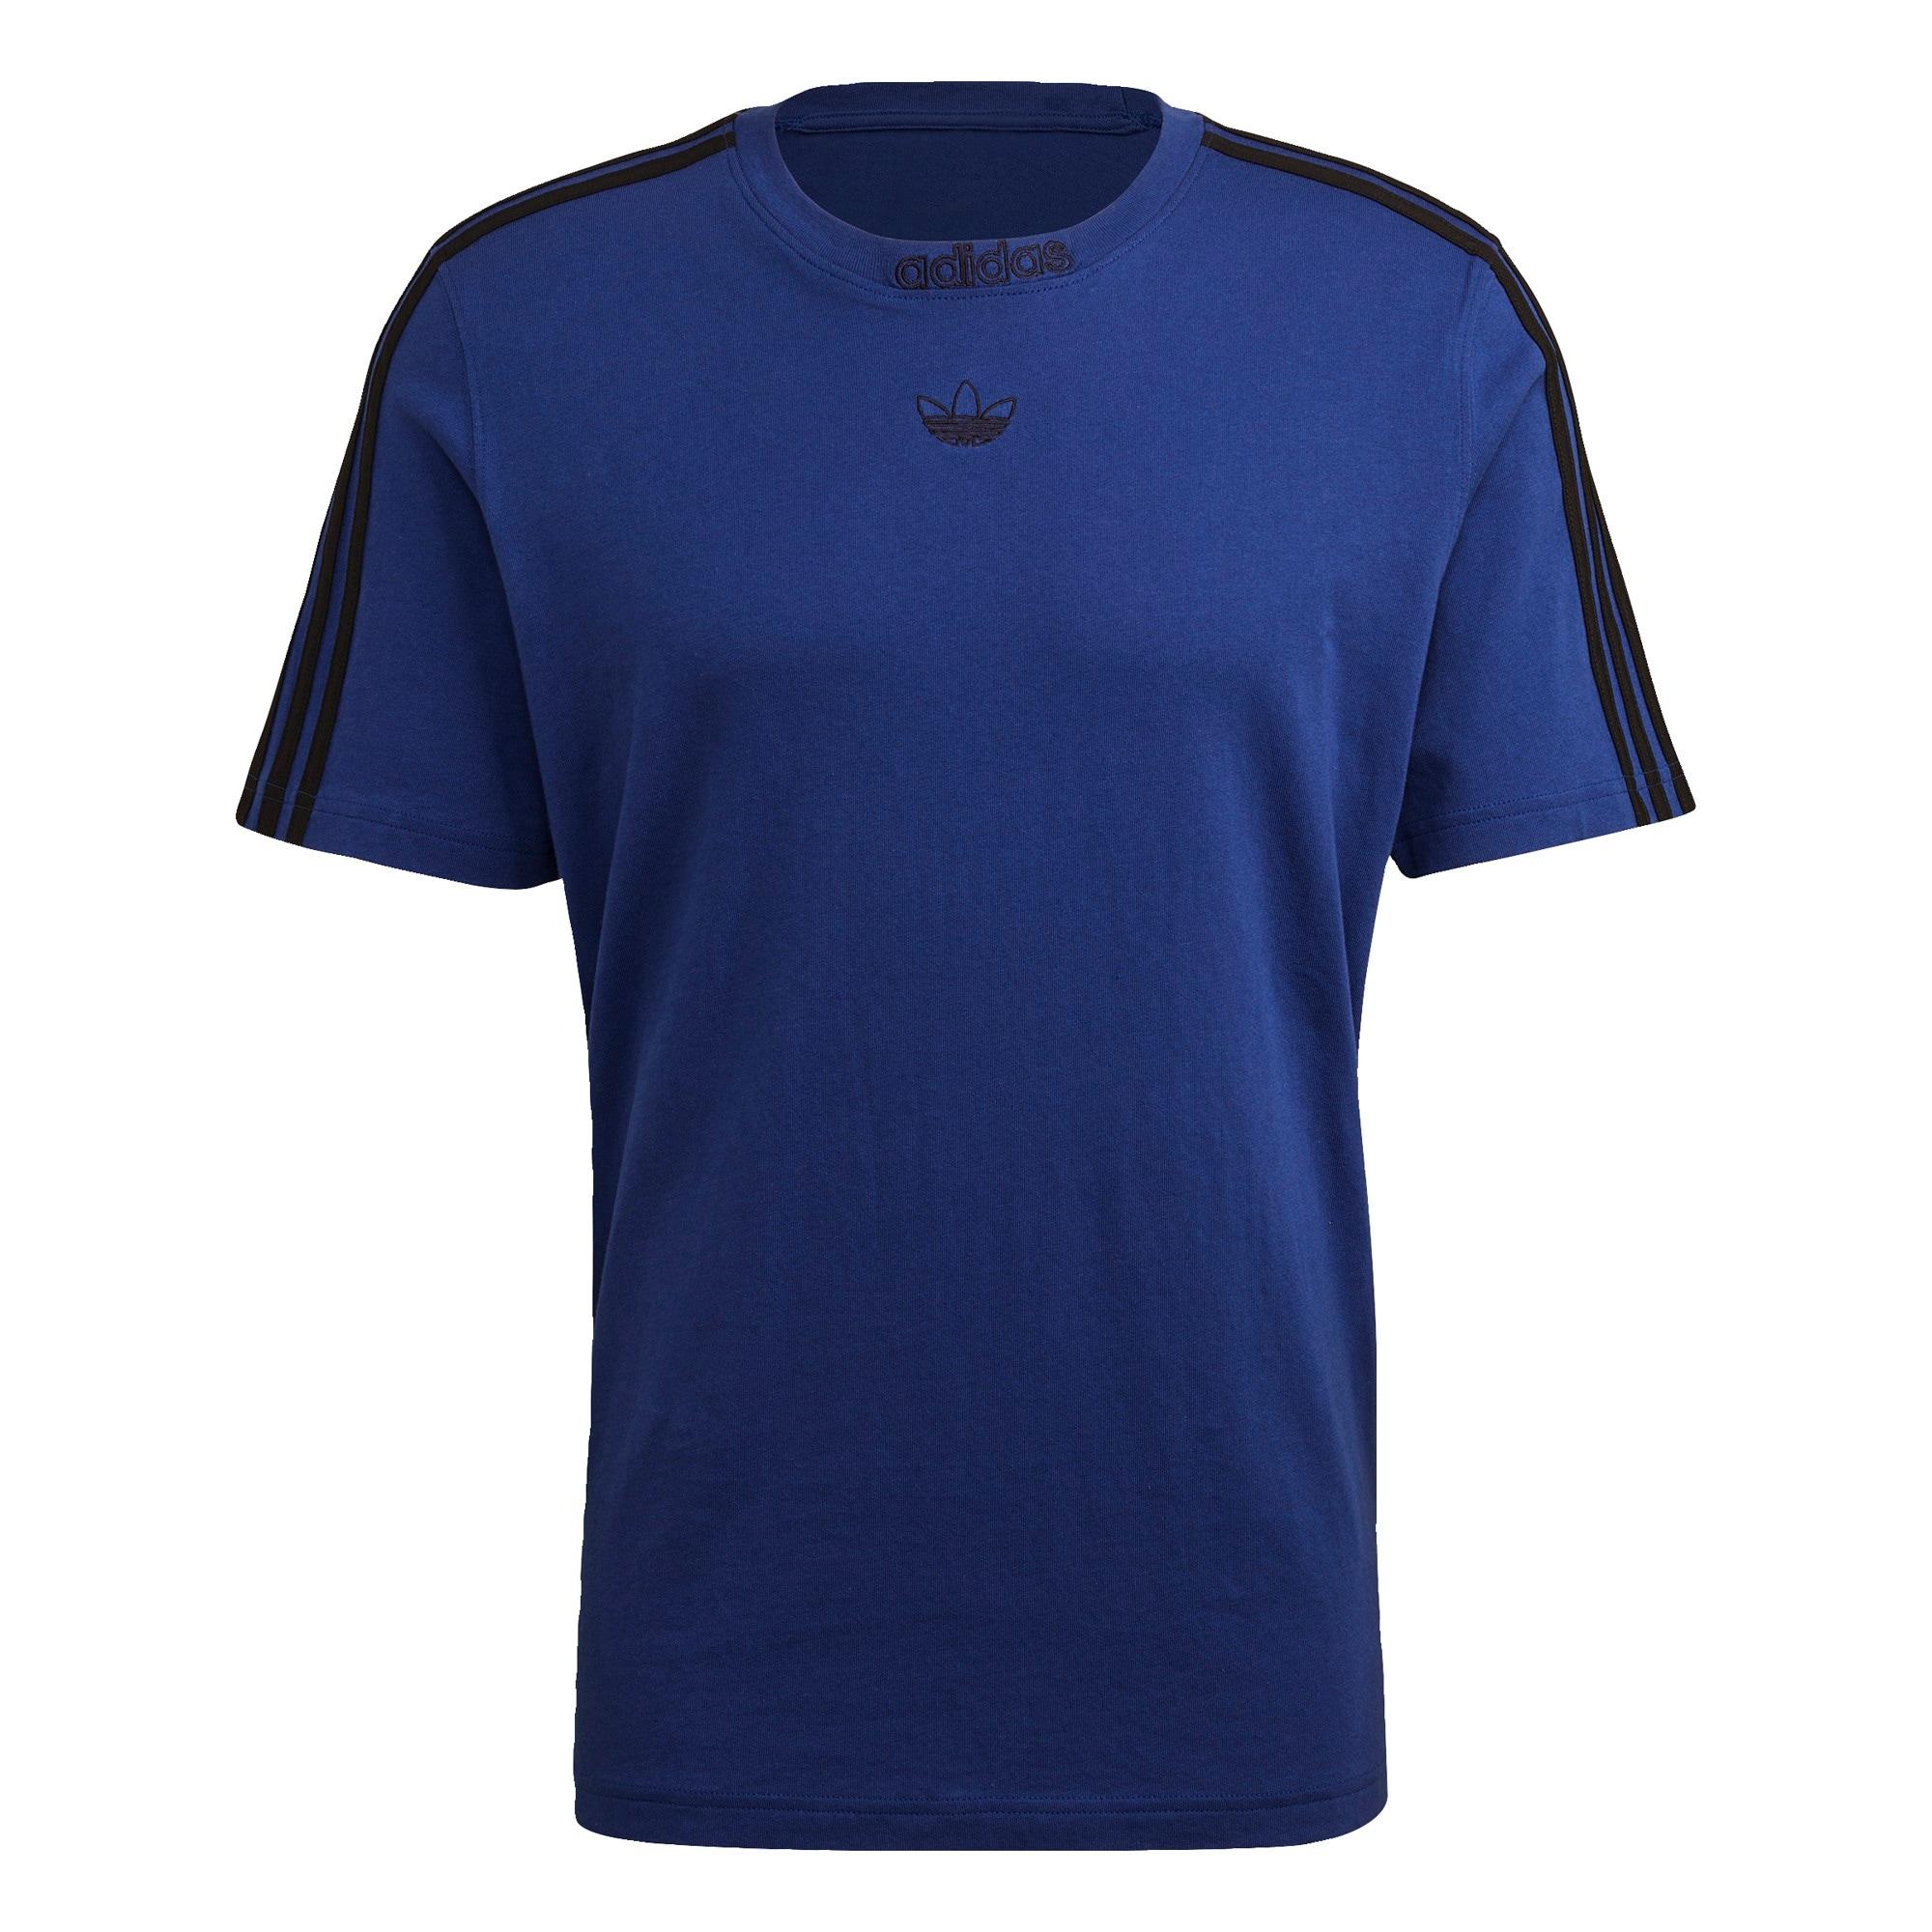 ADIDAS ORIGINALS Tričko  kobaltová modř / černá